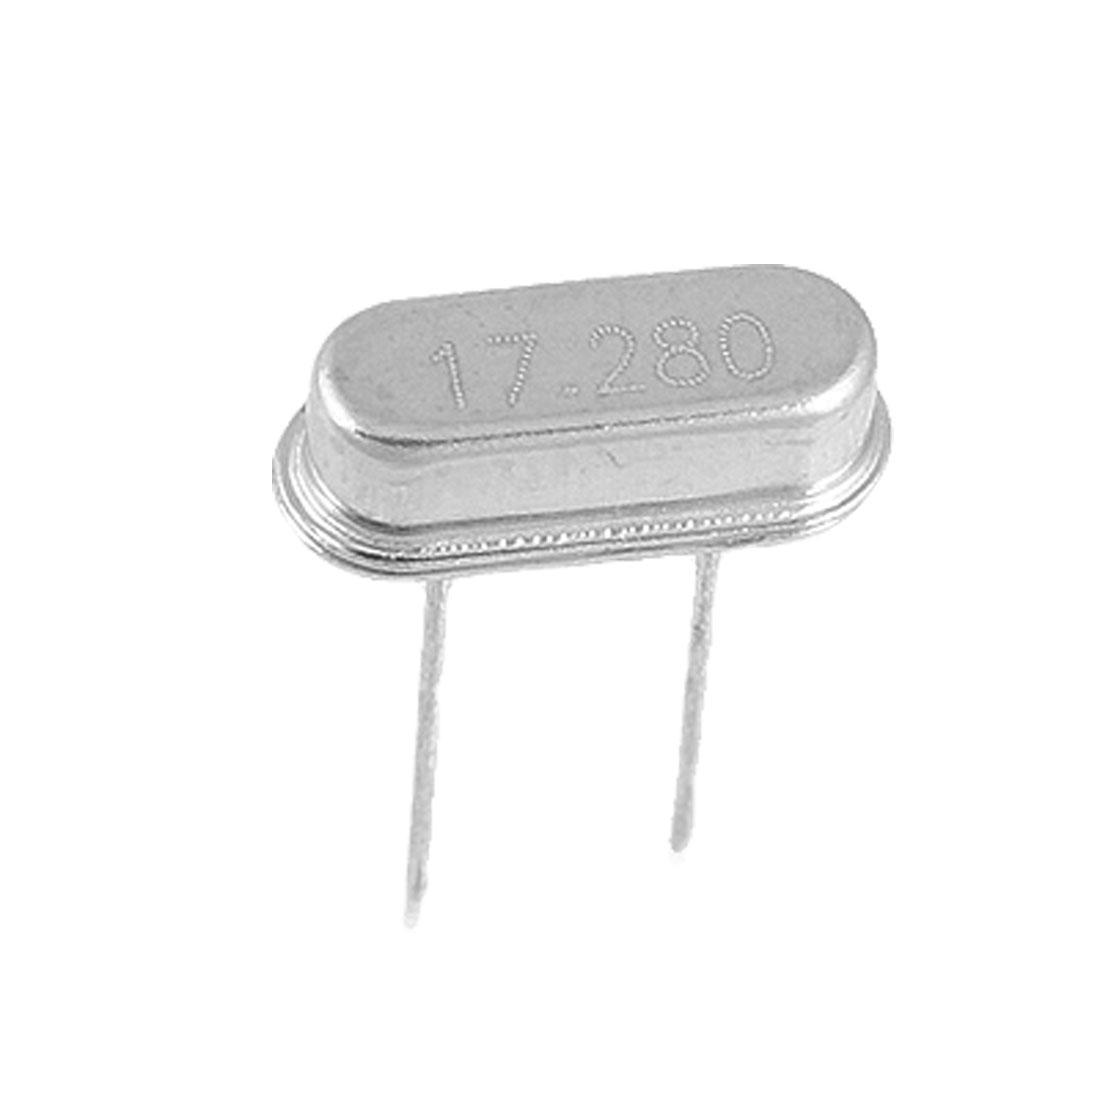 50 Pcs 17.280MHZ DIP Crystal Oscillator HC-49/S New